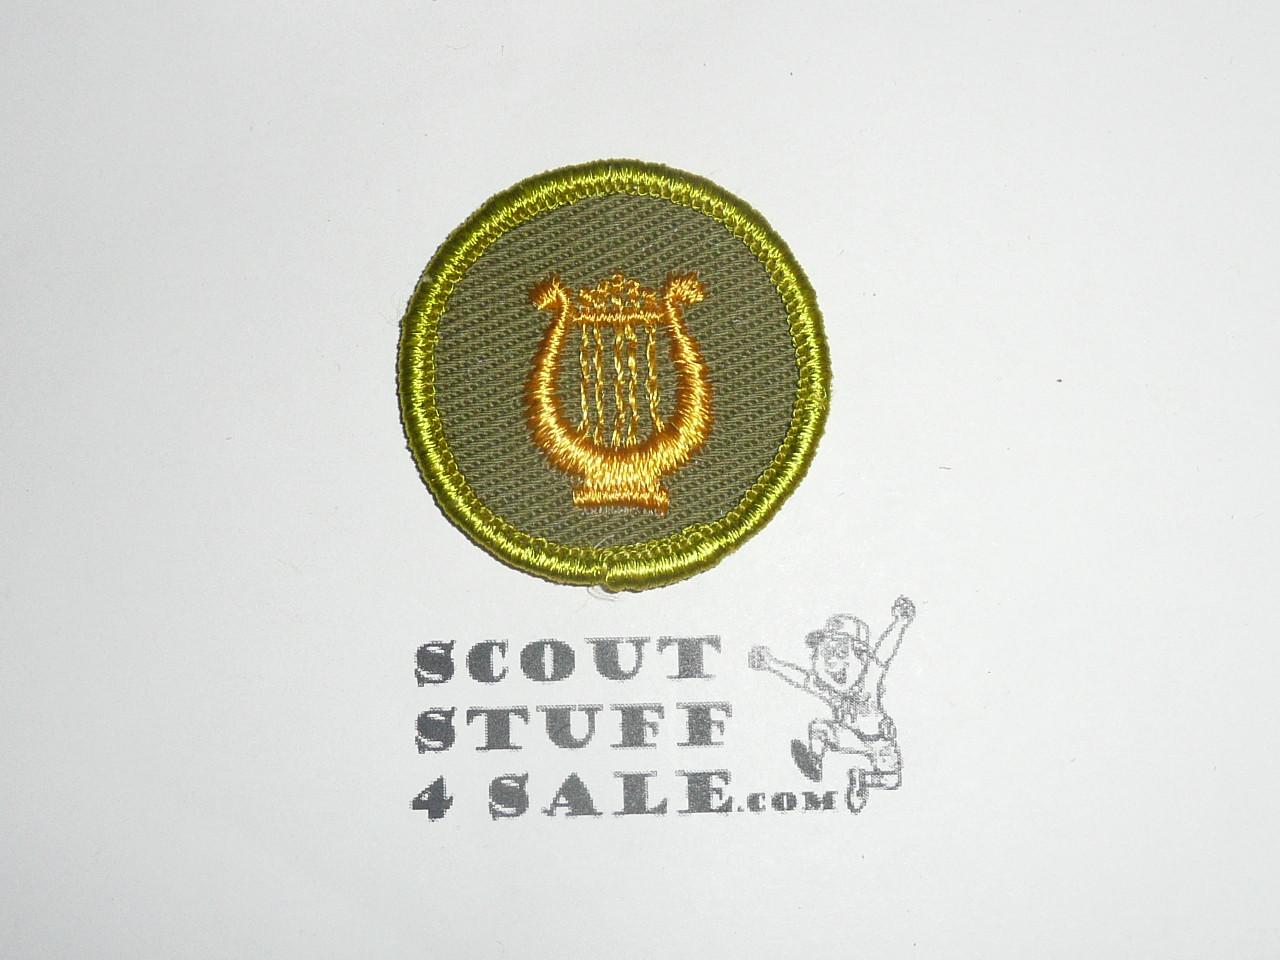 Music - Type F - Rolled Edge Twill Merit Badge (1961-1968), sewn